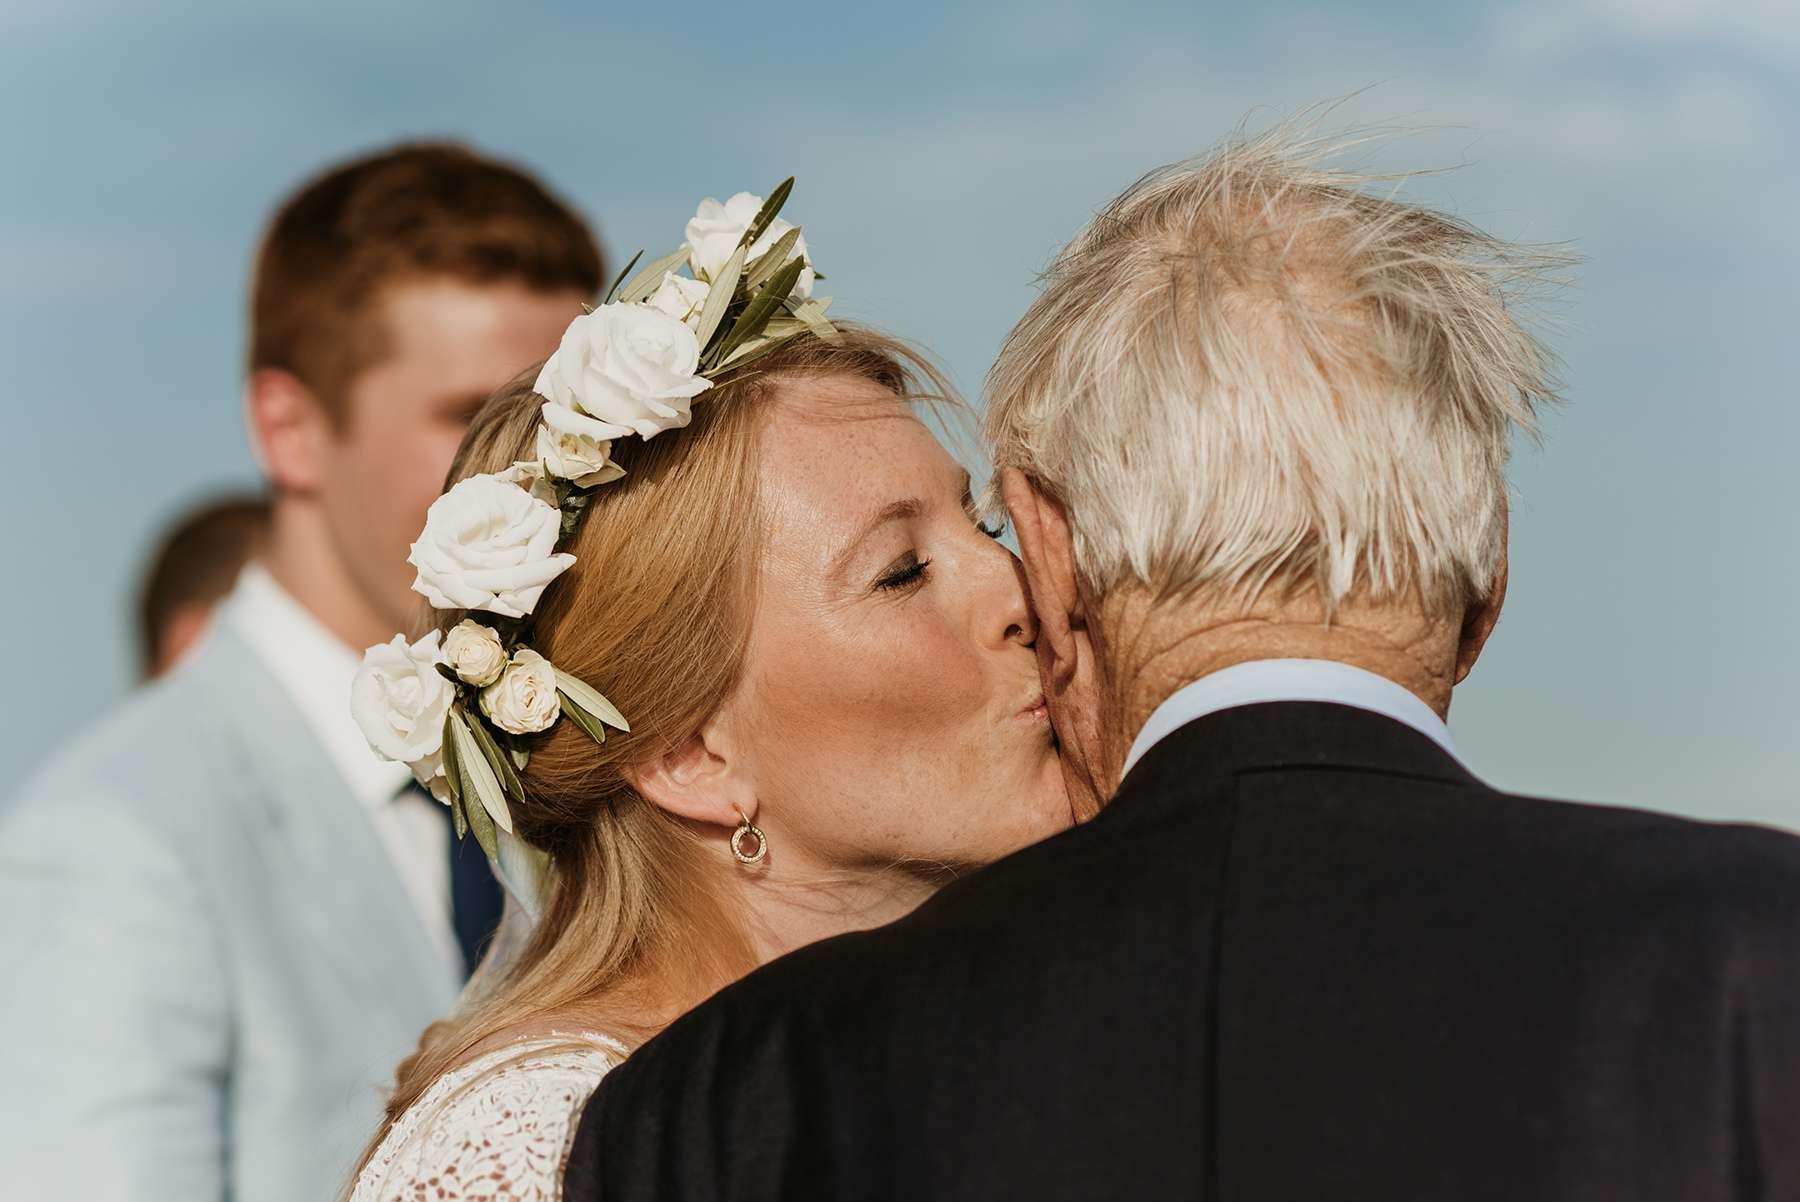 <p>Bride kissing father of bride</p><br><br>